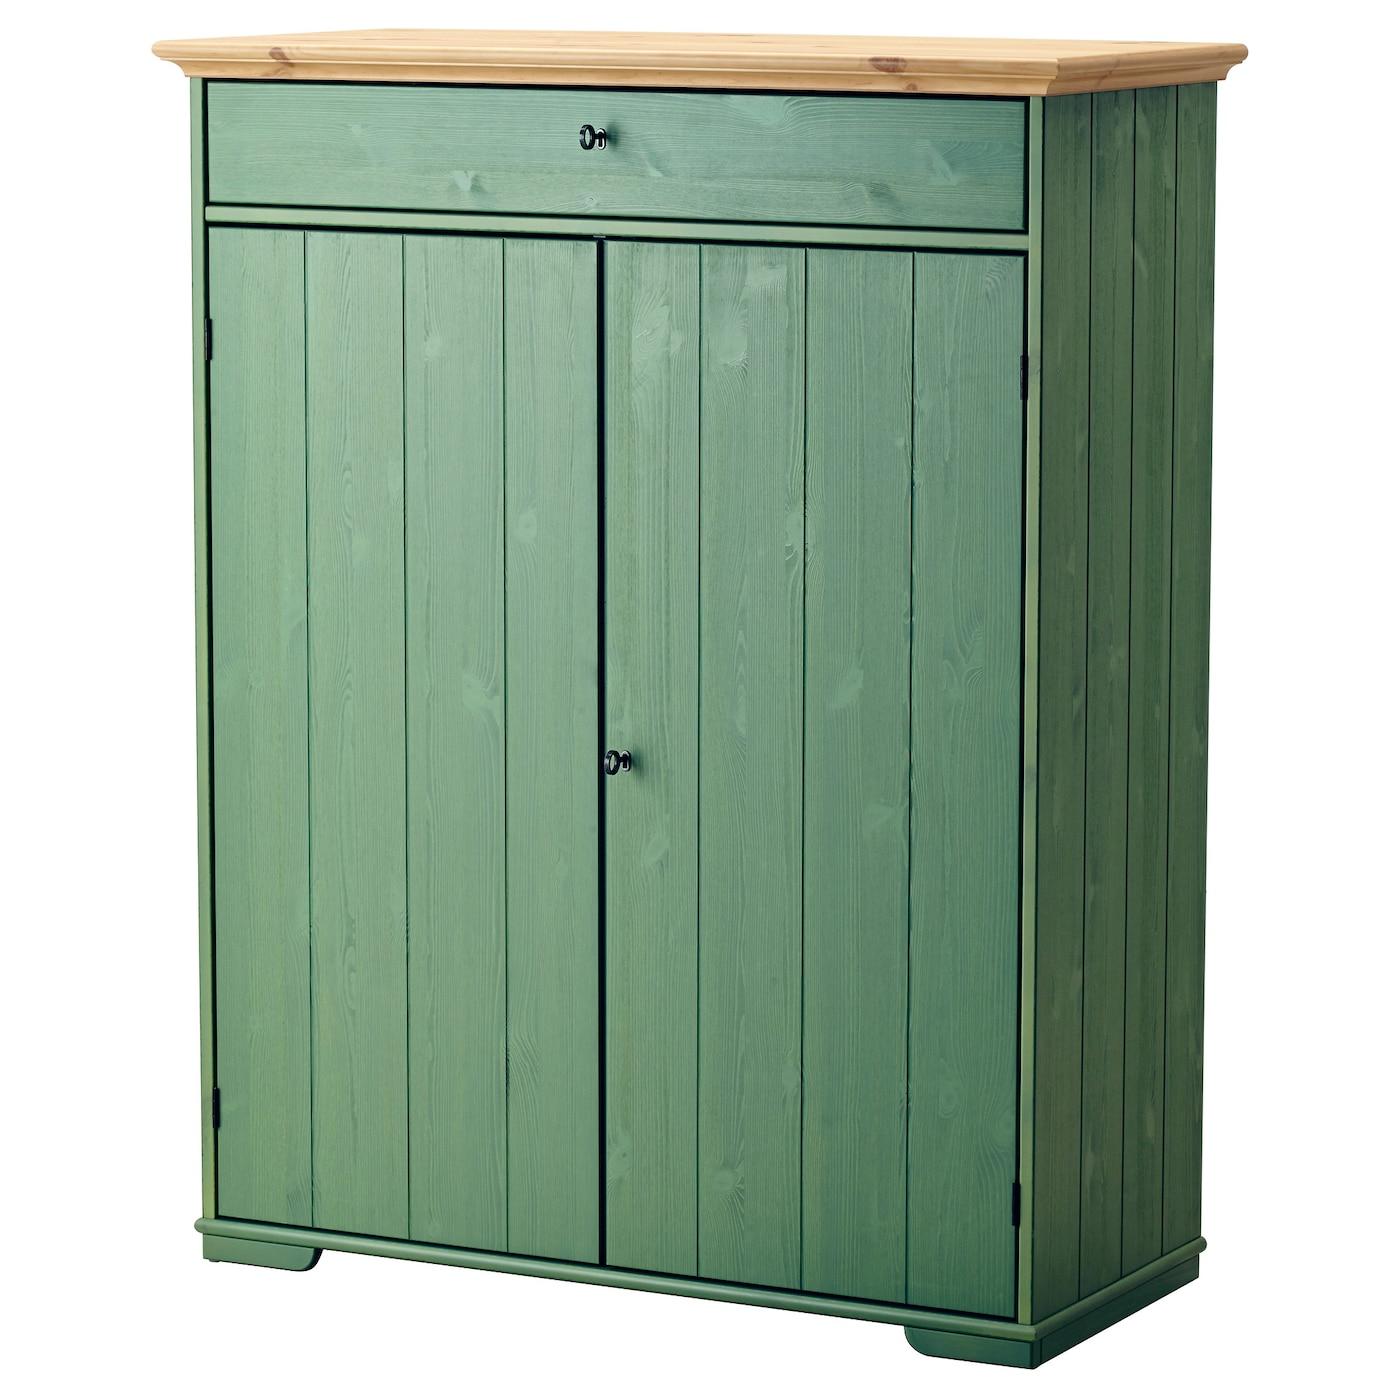 hurdal linen cabinet green 109x50x137 cm ikea. Black Bedroom Furniture Sets. Home Design Ideas